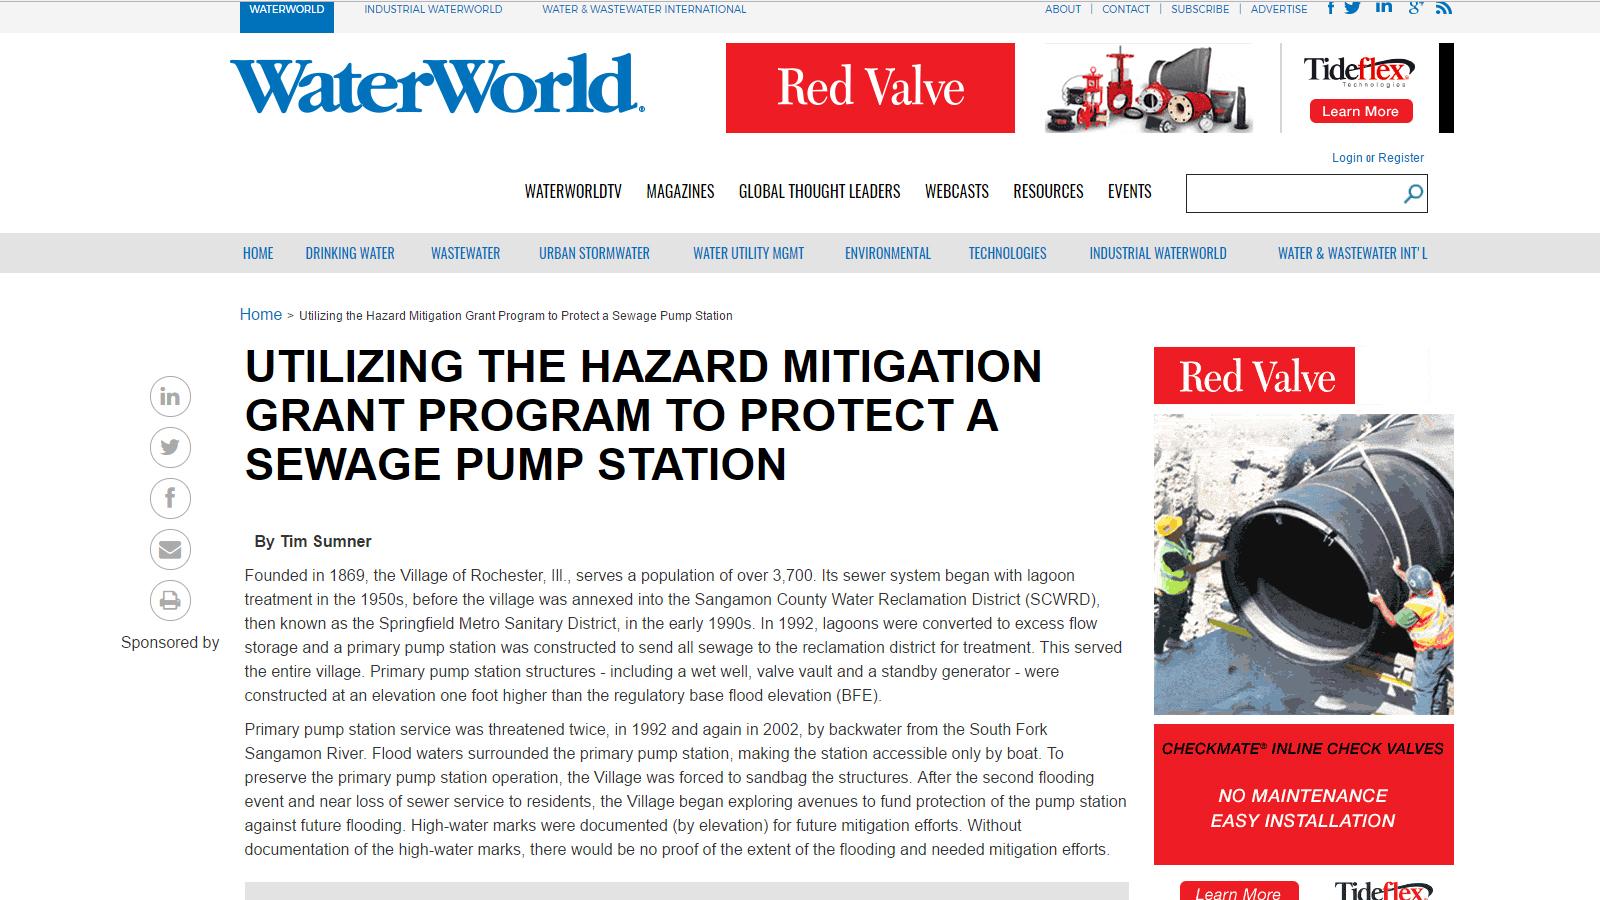 WaterWorld Website Image